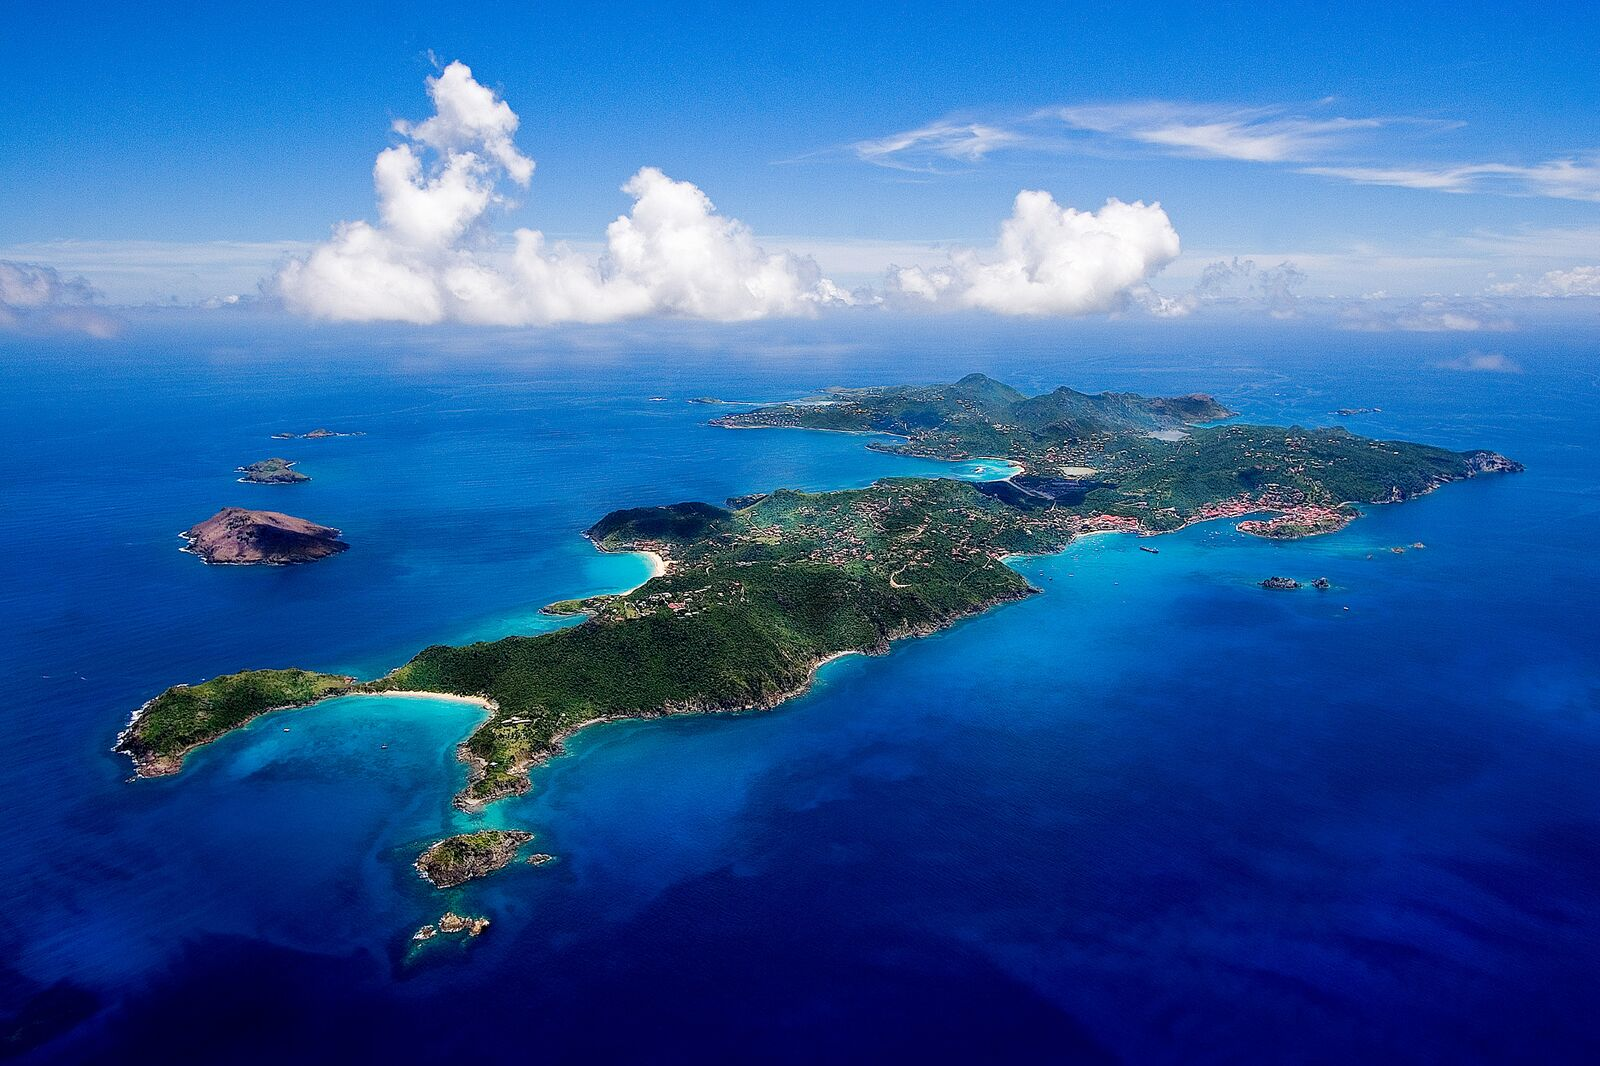 St Barts a paradise island